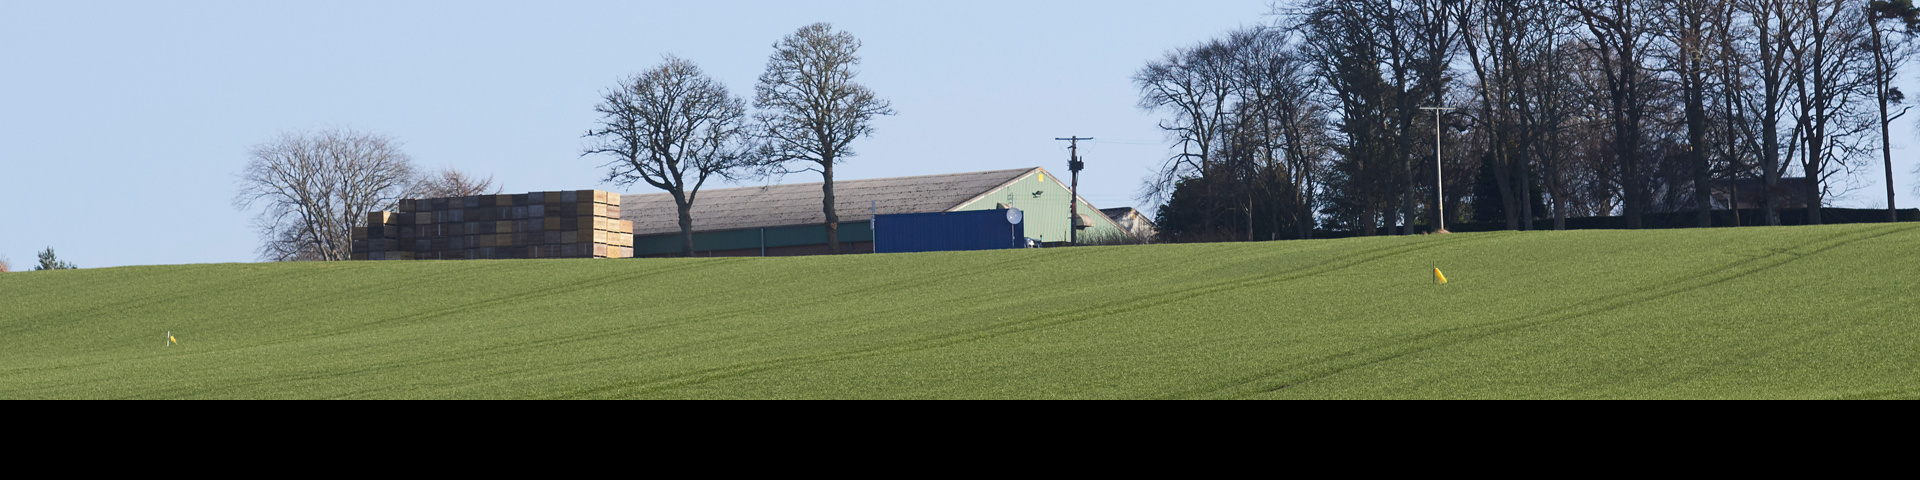 Farm field with farm building